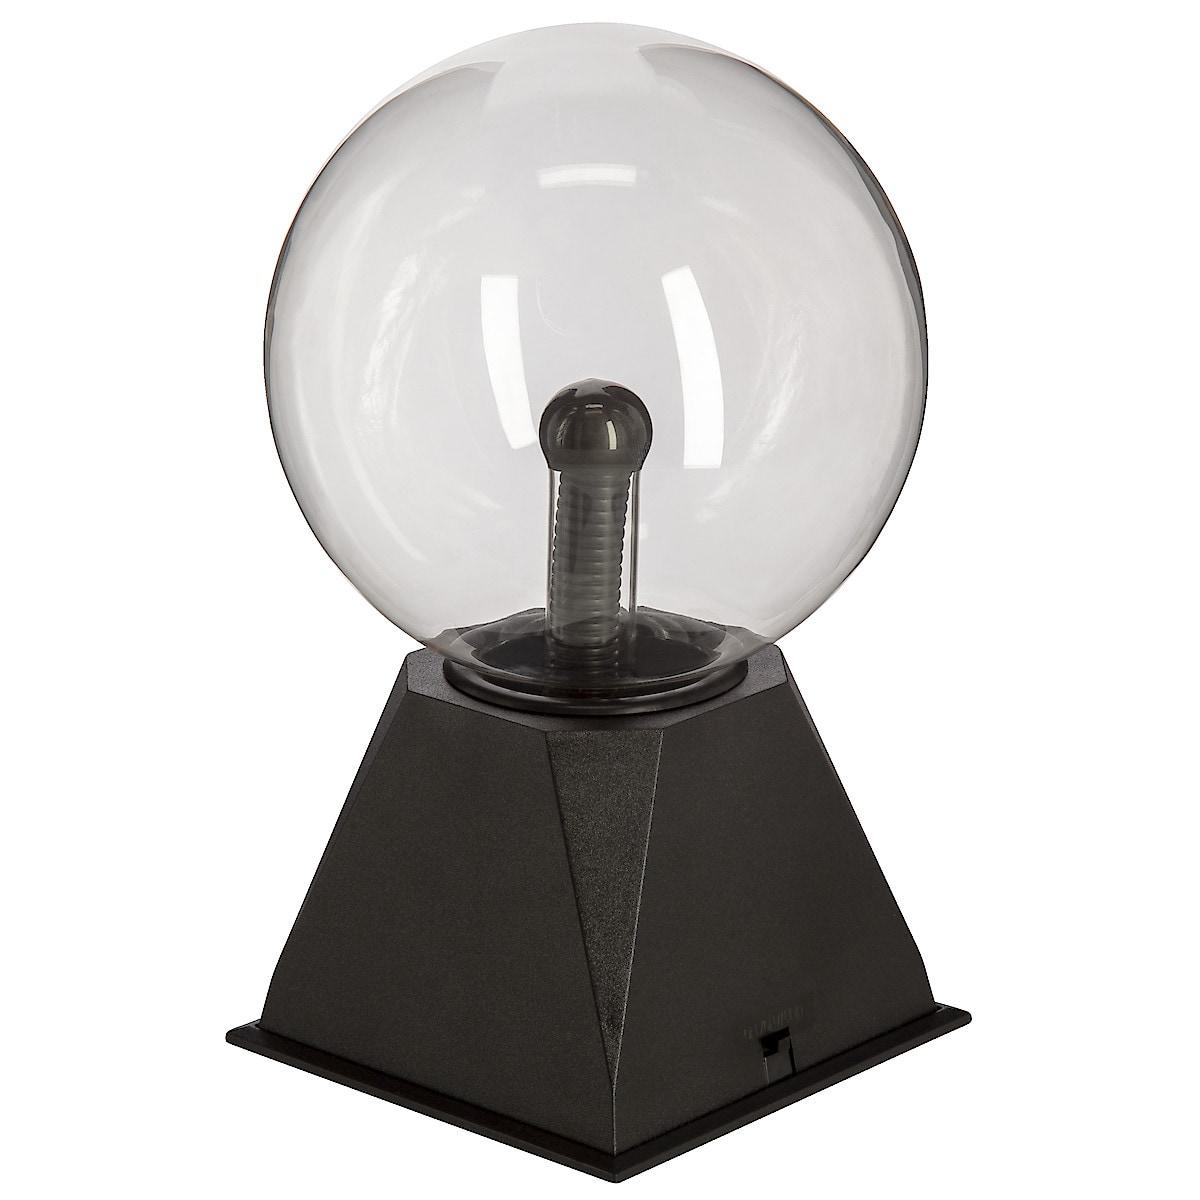 Plasmaboll Ø 15 cm